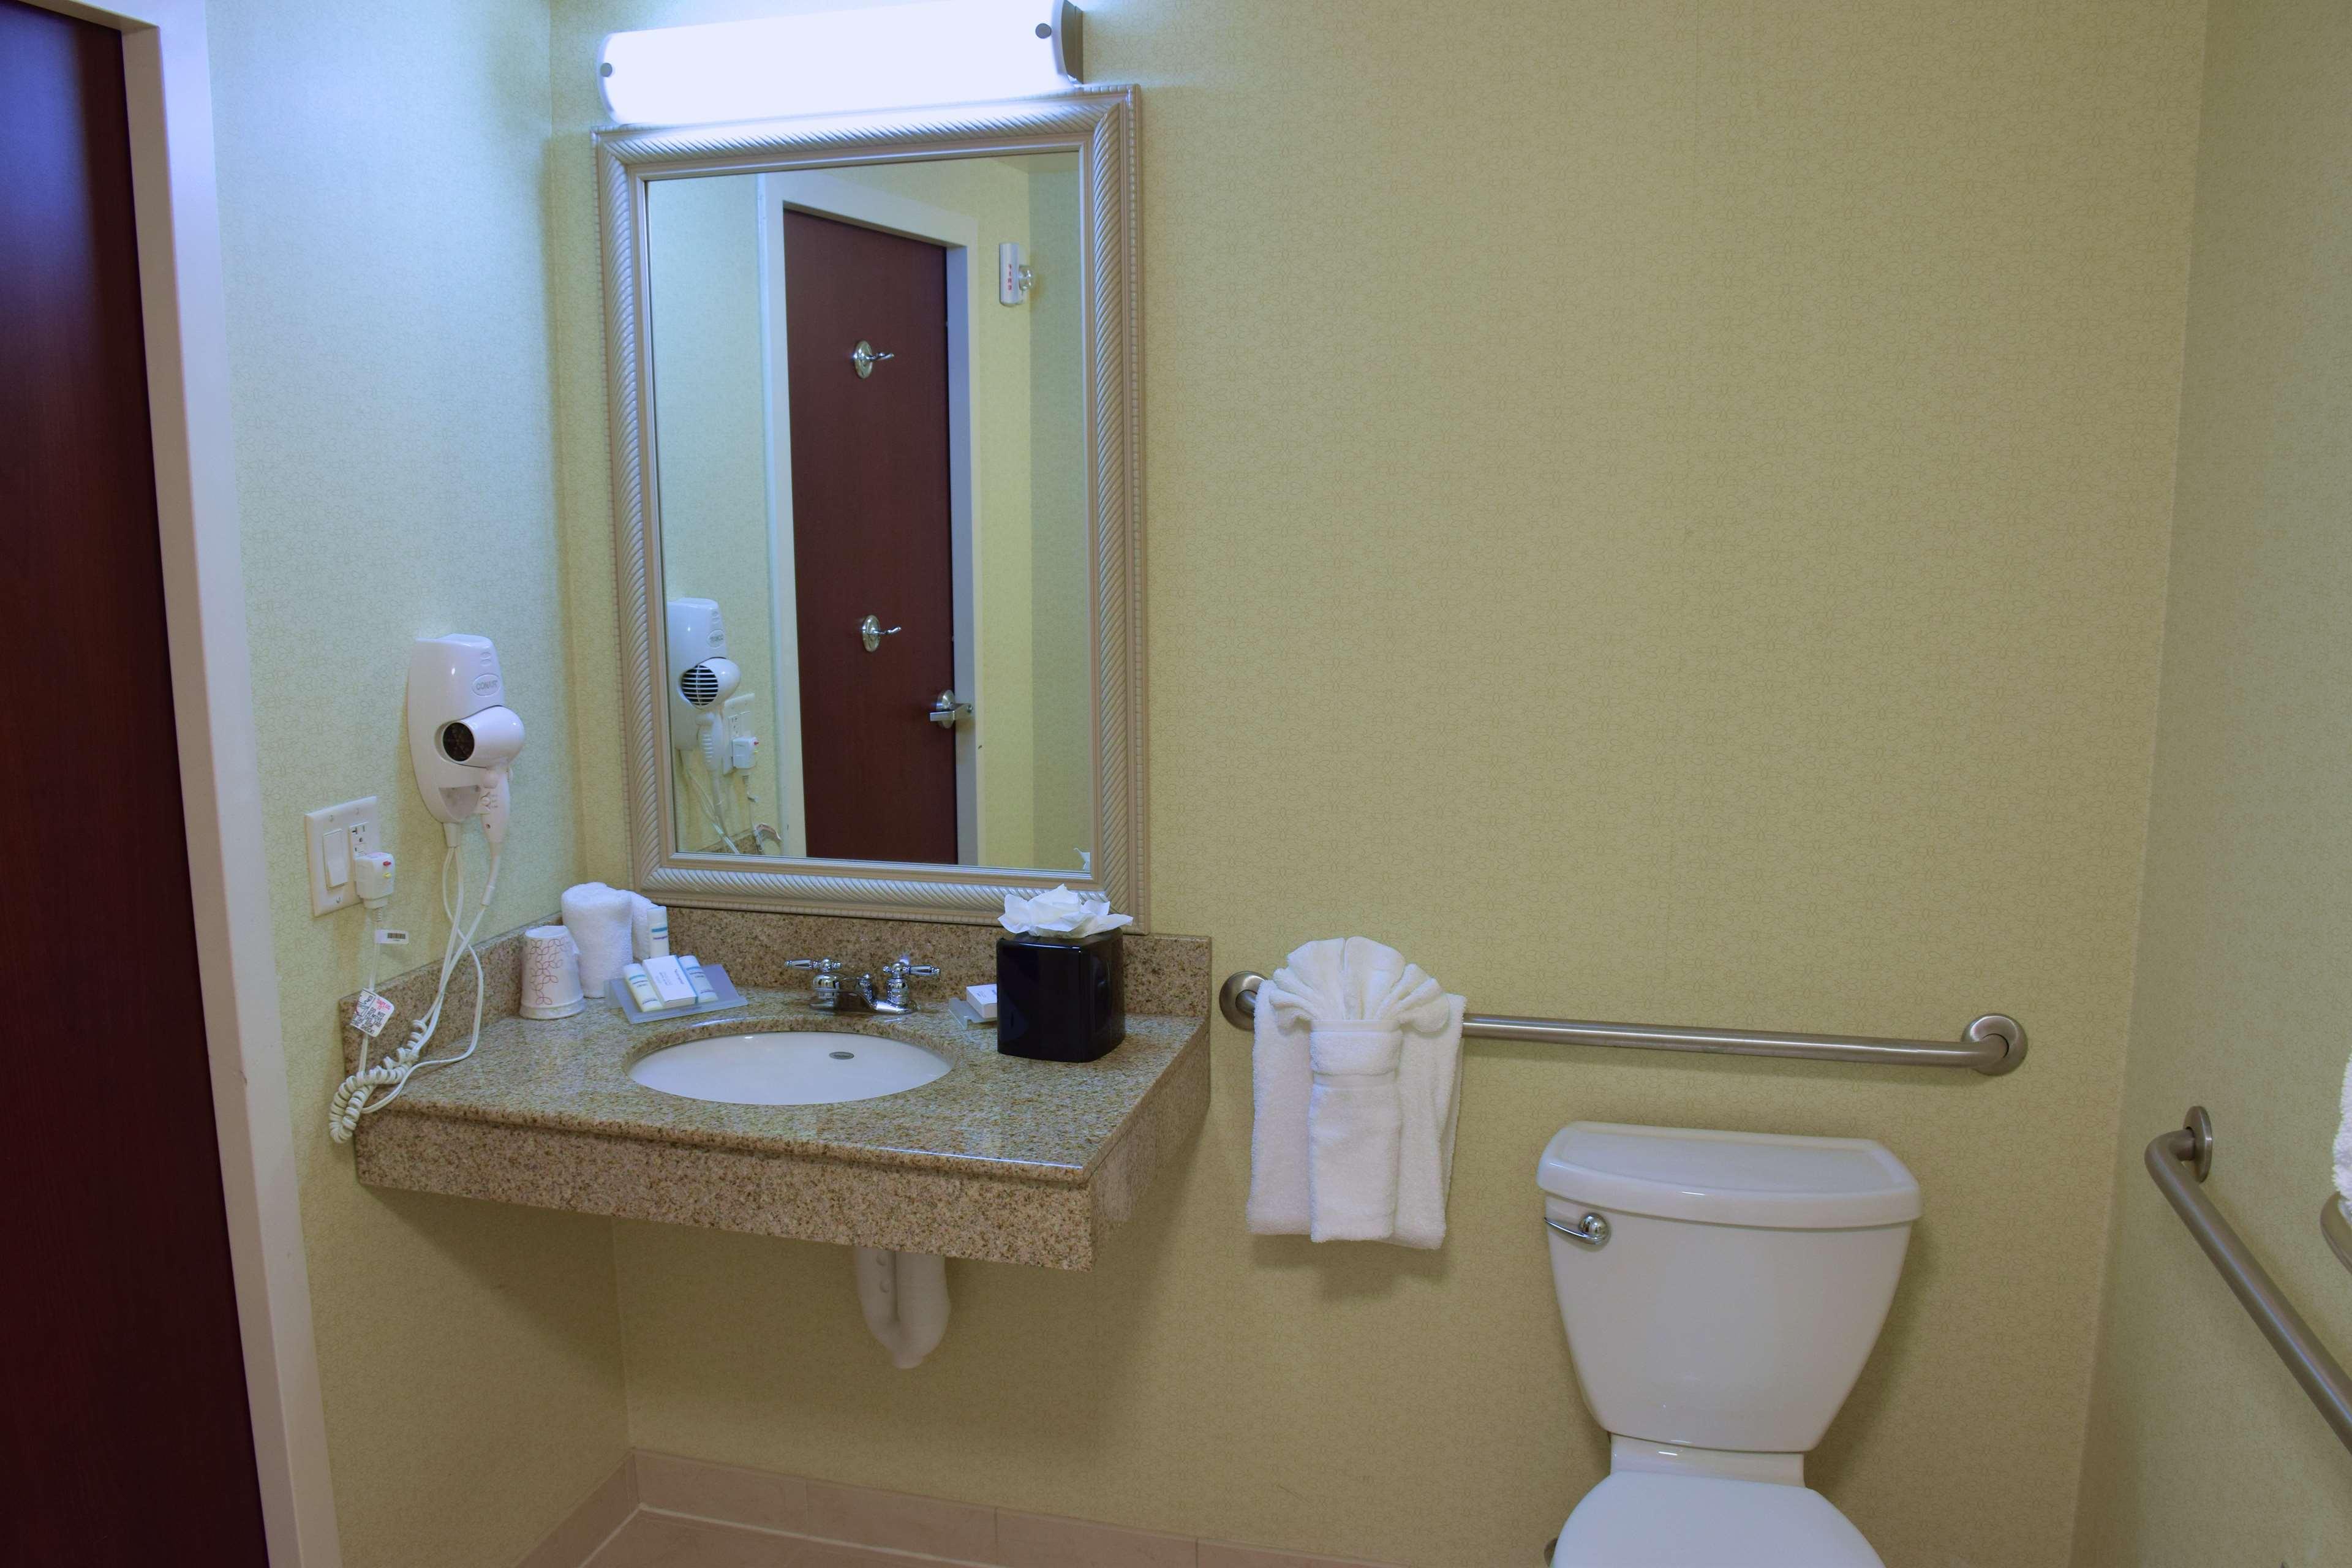 Hilton Garden Inn Dayton Beavercreek image 32